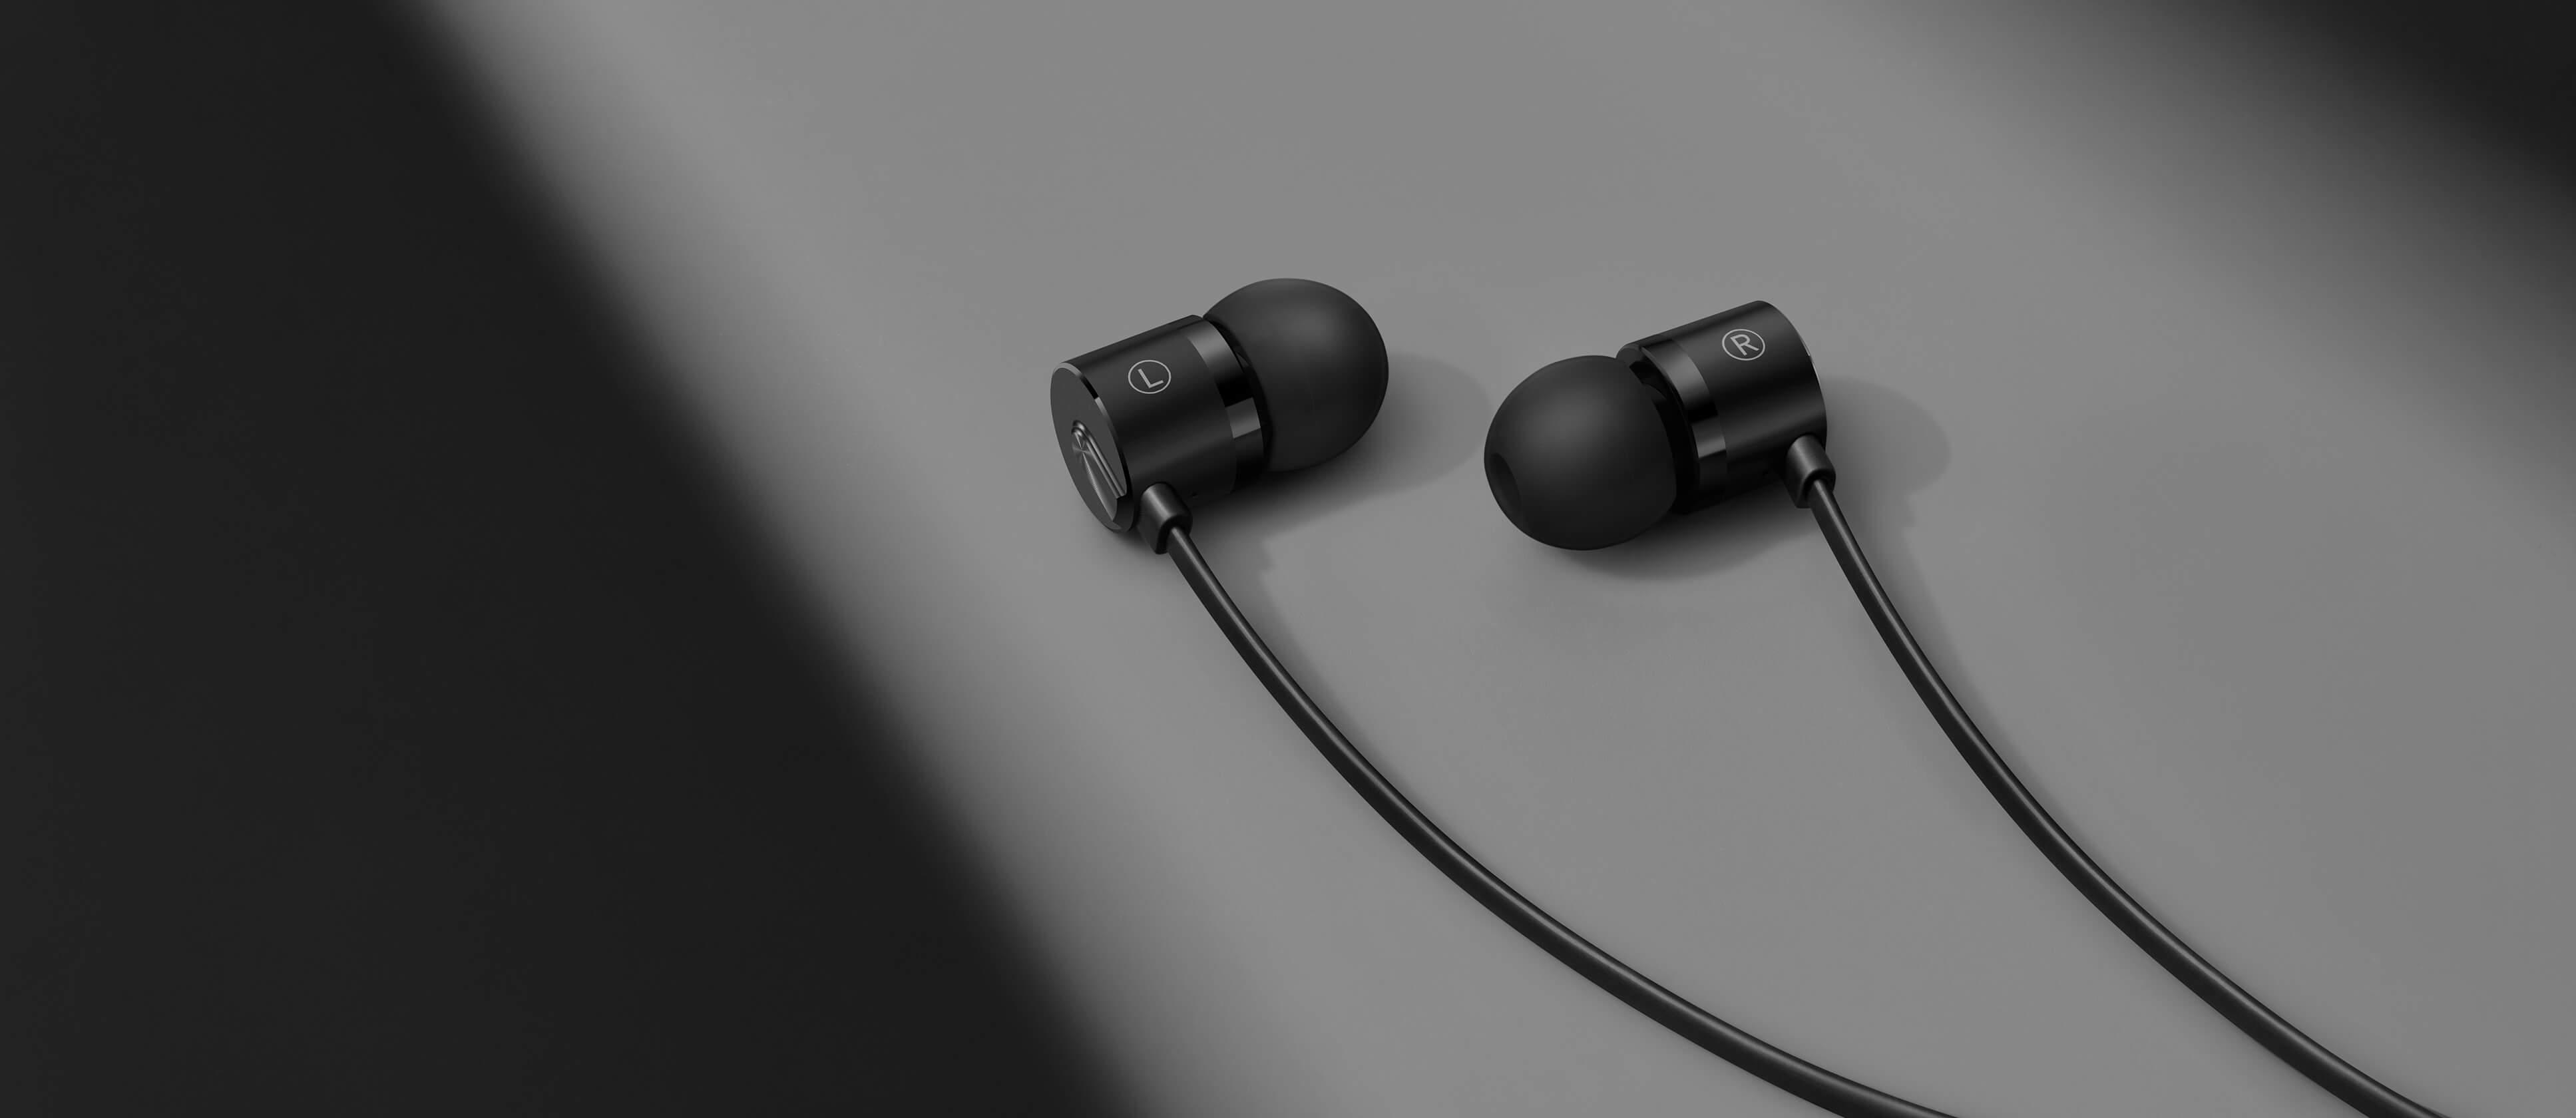 ONEPLUS TYPE C EARPHONES BANNER - Excellent Sound Quality